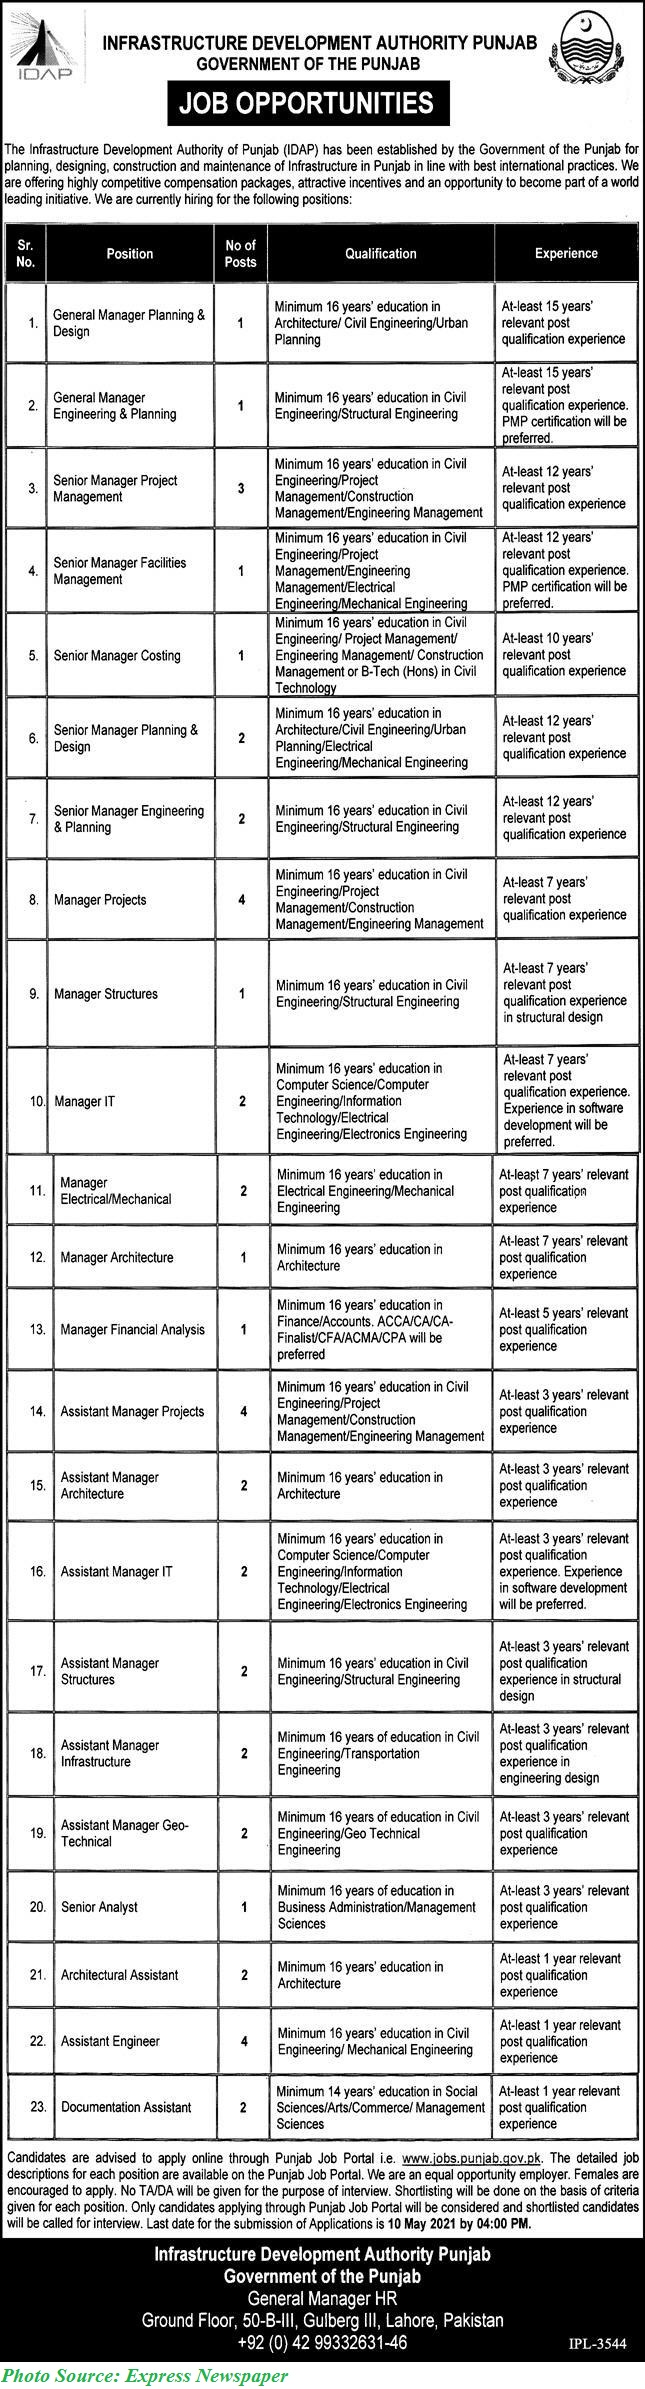 Infrastructure Development Authority Punjab Jobs 2021 Apply Online for Latest IDAP Jobs 2021